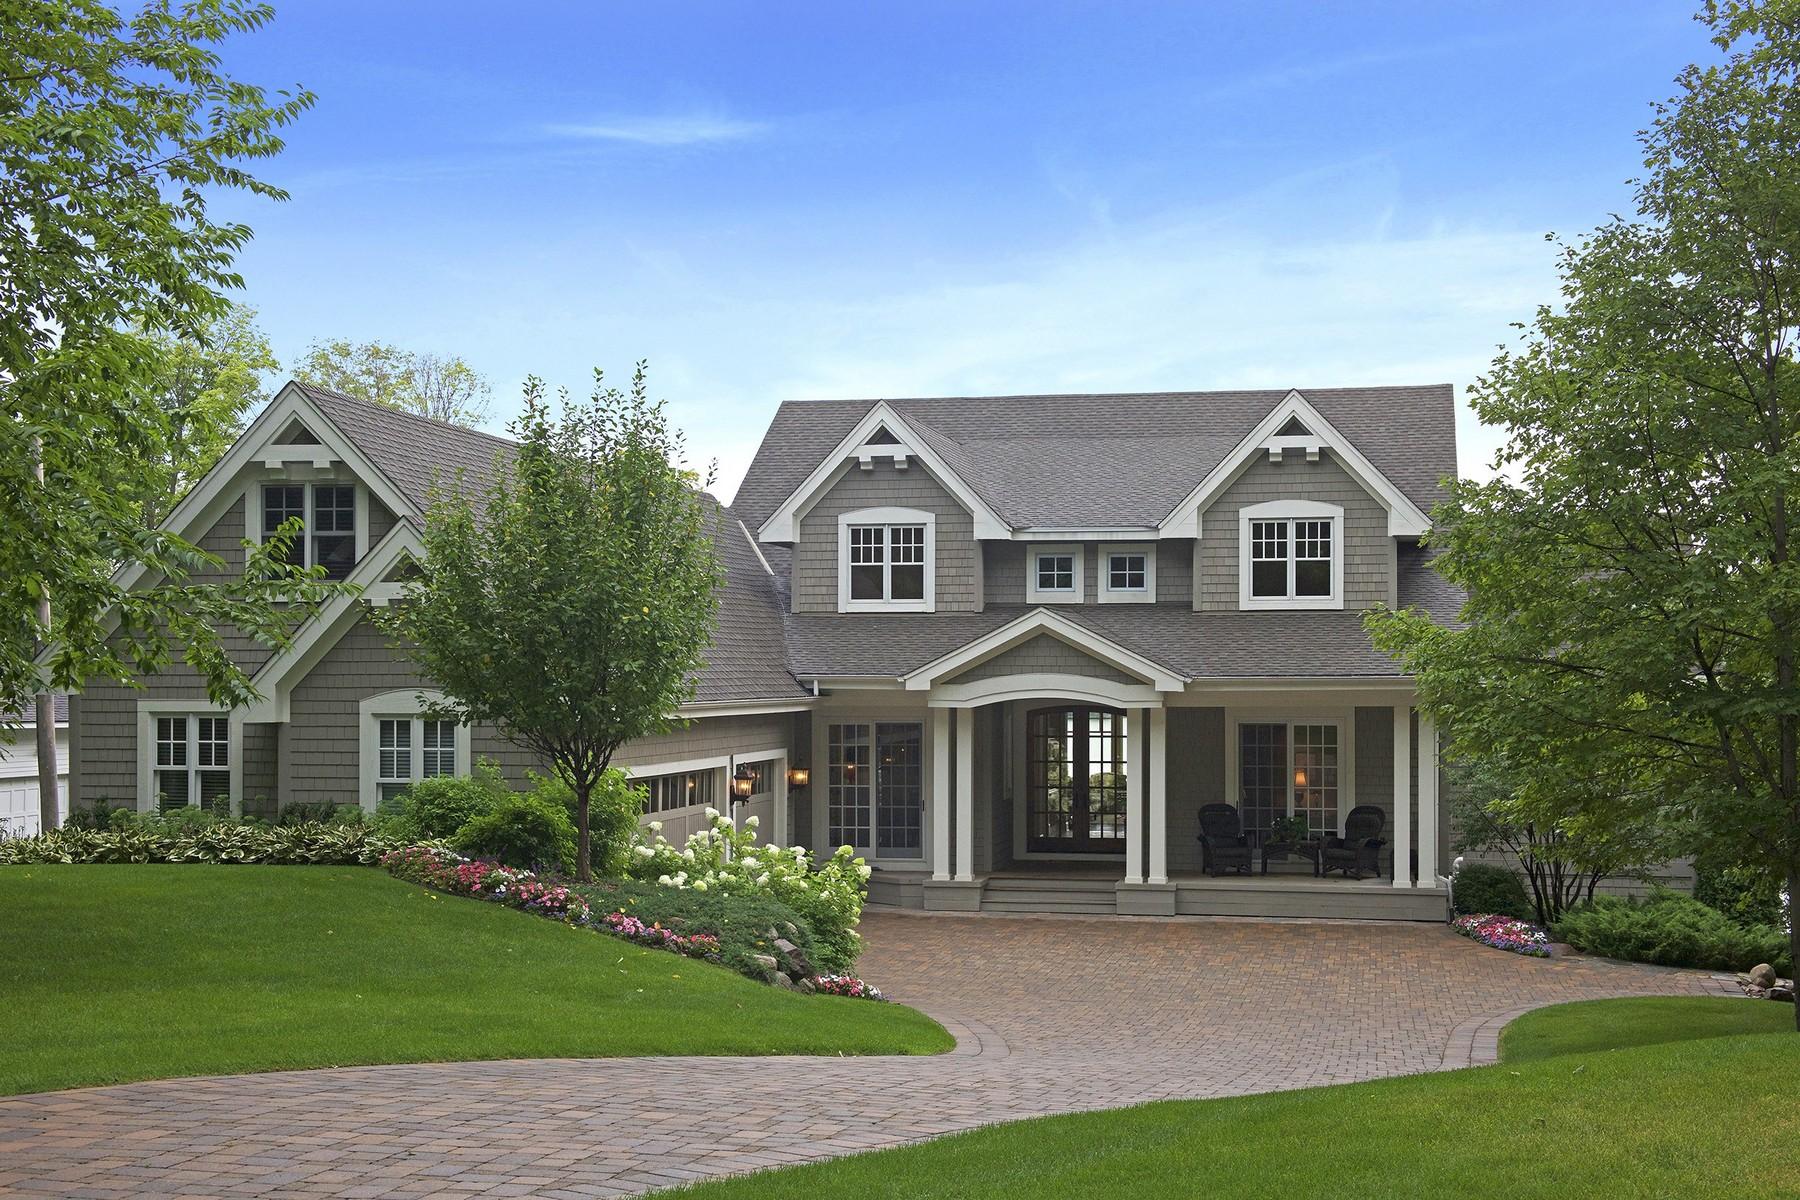 Single Family Home for Sale at 5958 Hardscrabble Circle Minnetrista, Minnesota 55364 United States